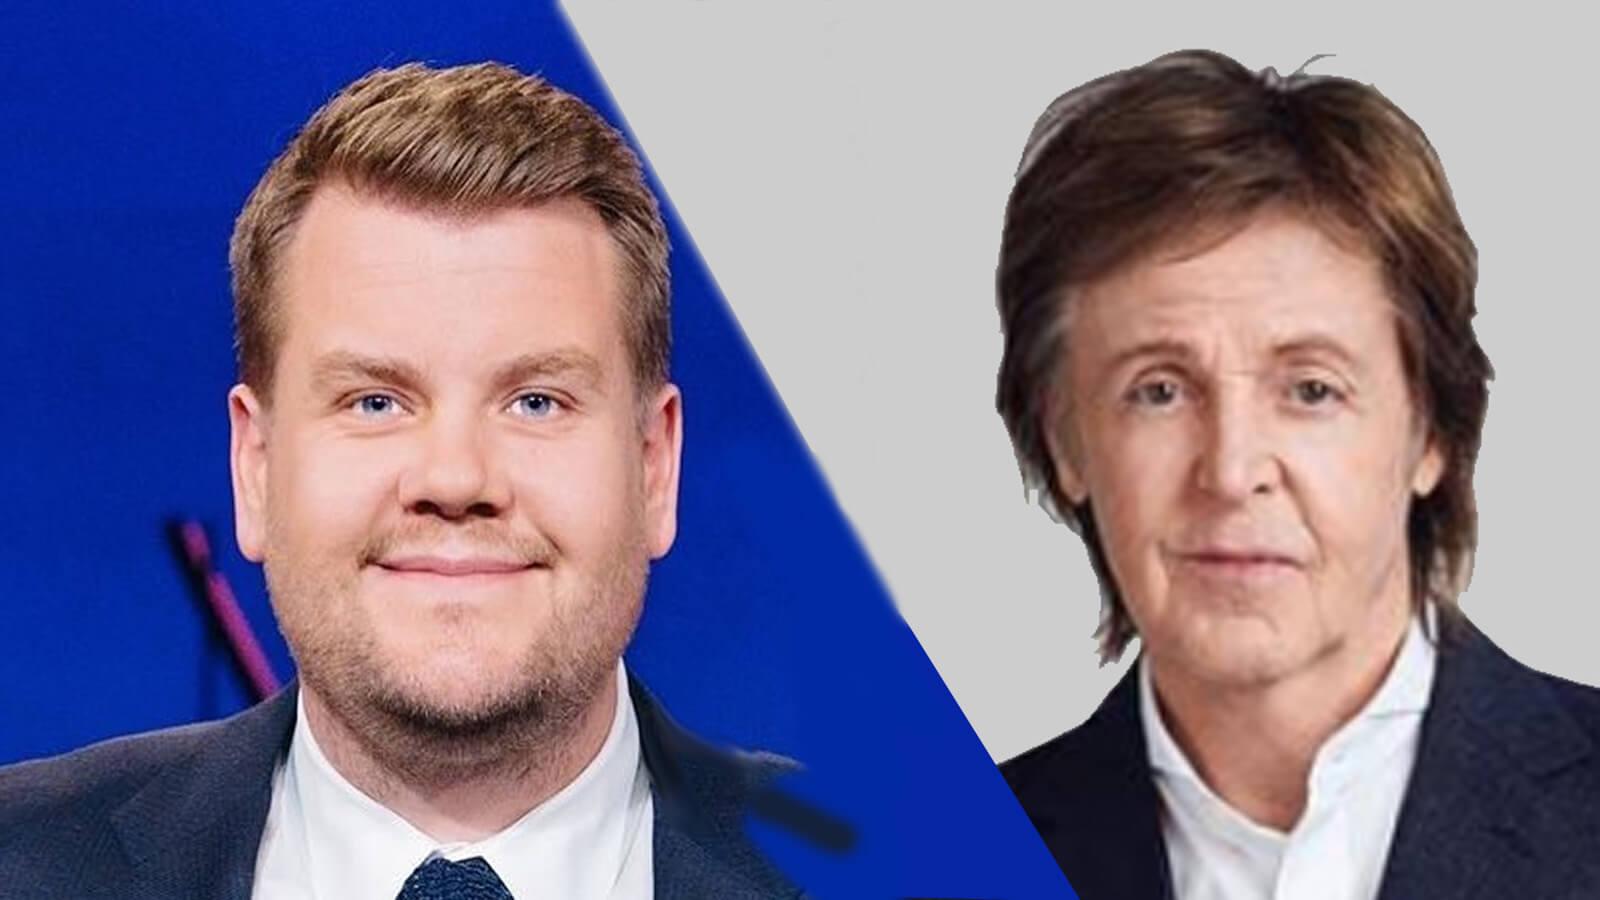 James Corden Goes Vegetarian and Films 'Carpool Karaoke' With Vegan Musician Paul McCartney